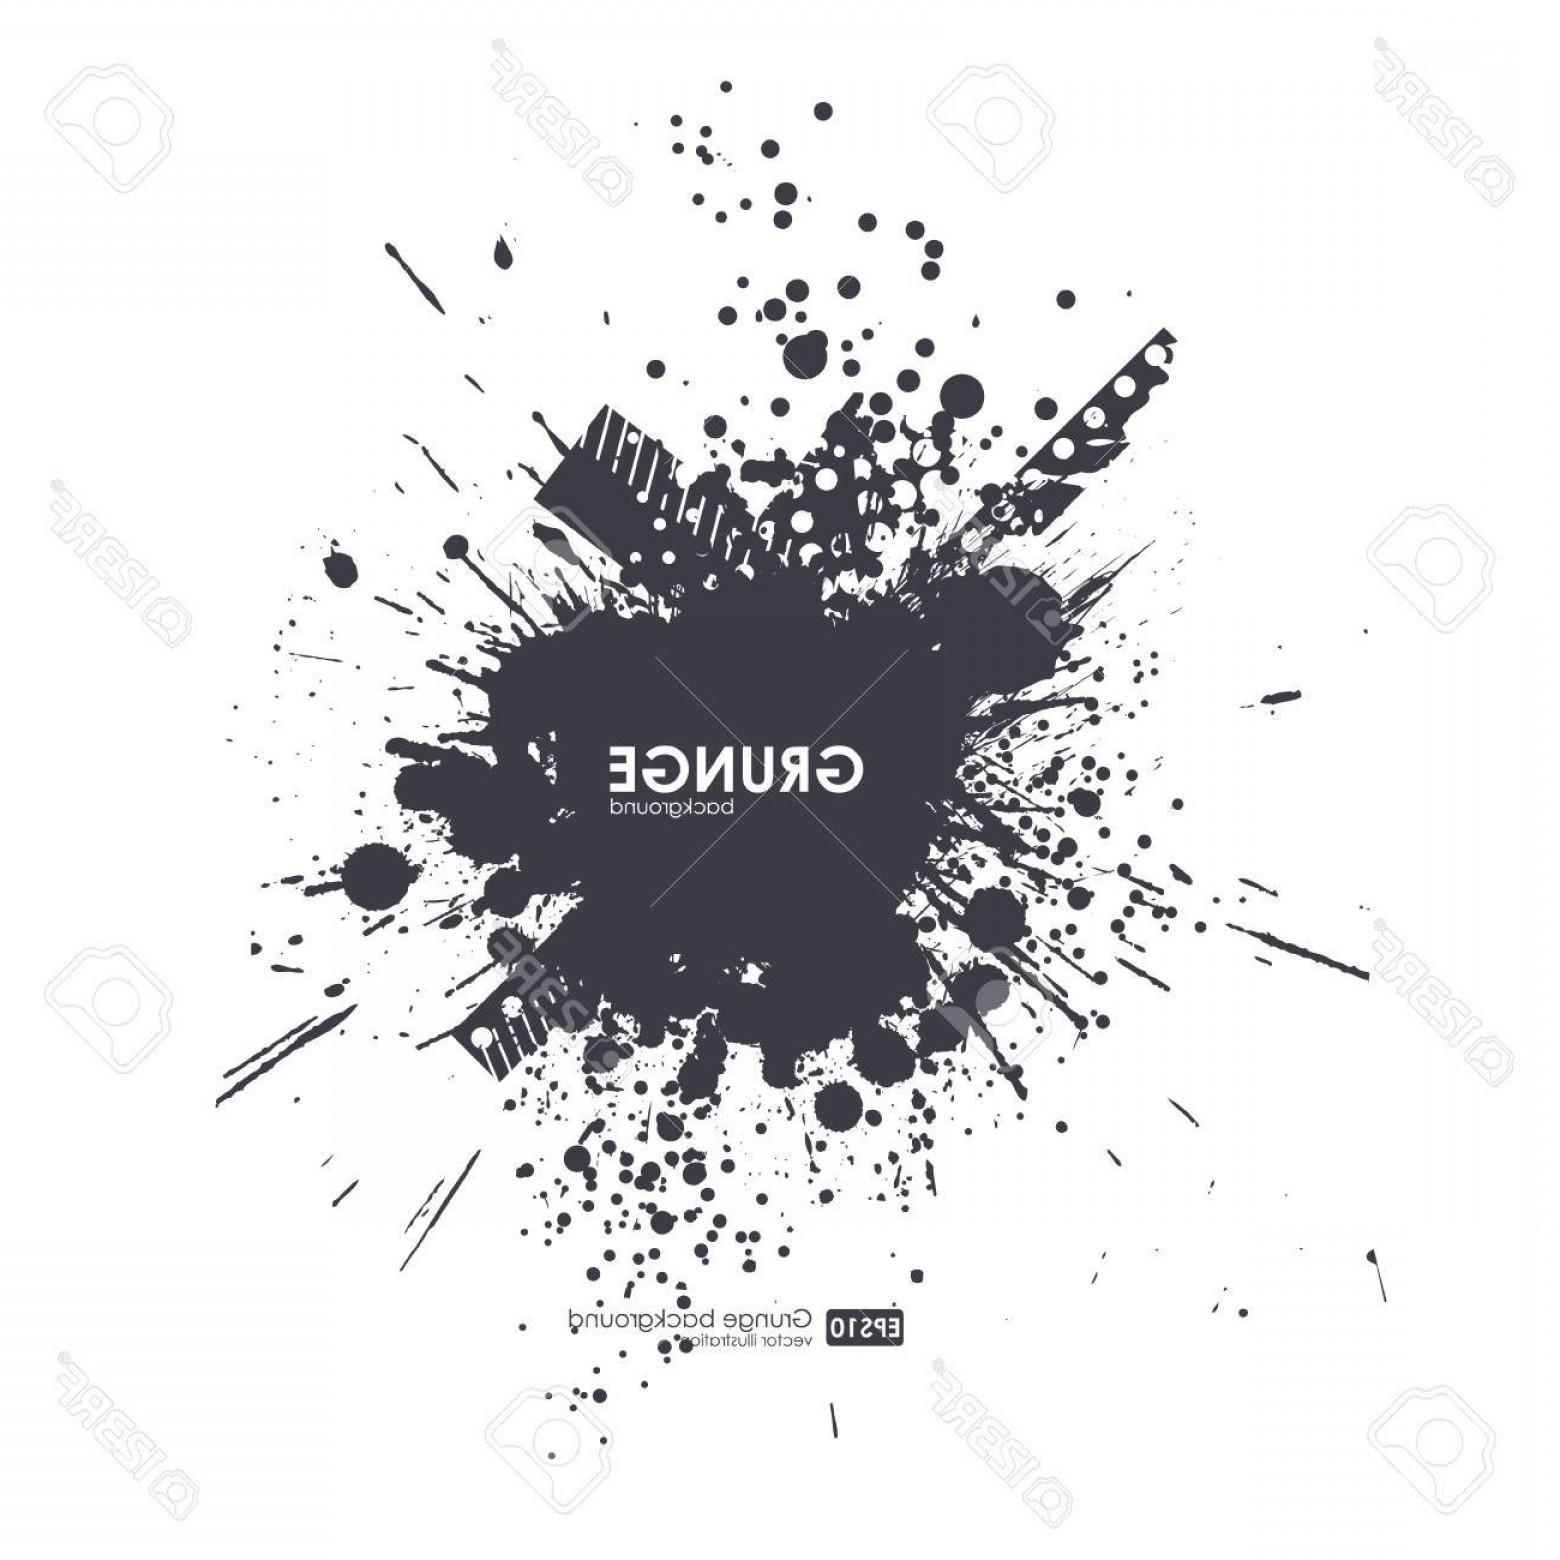 1560x1560 Photostock Vector Splatter Background Black Ink Splats Spray Paint